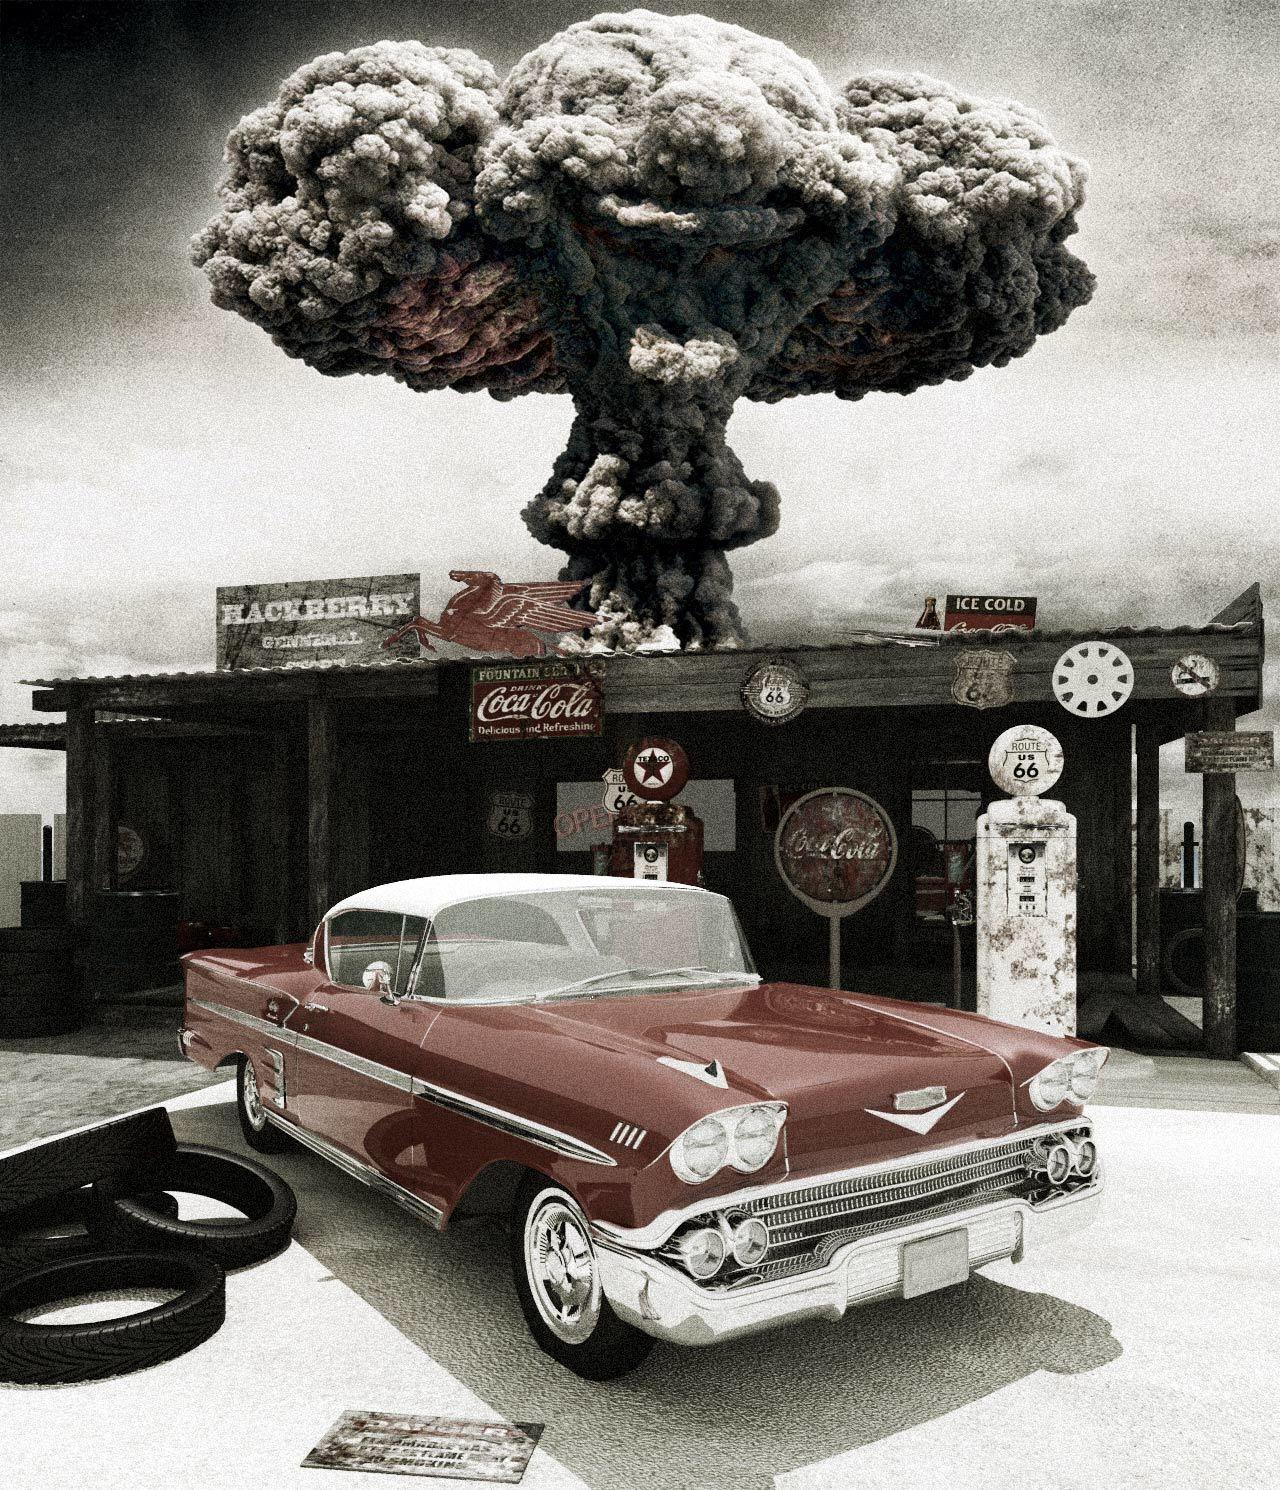 Shano apocalypse now 1 c9963250 cgpw